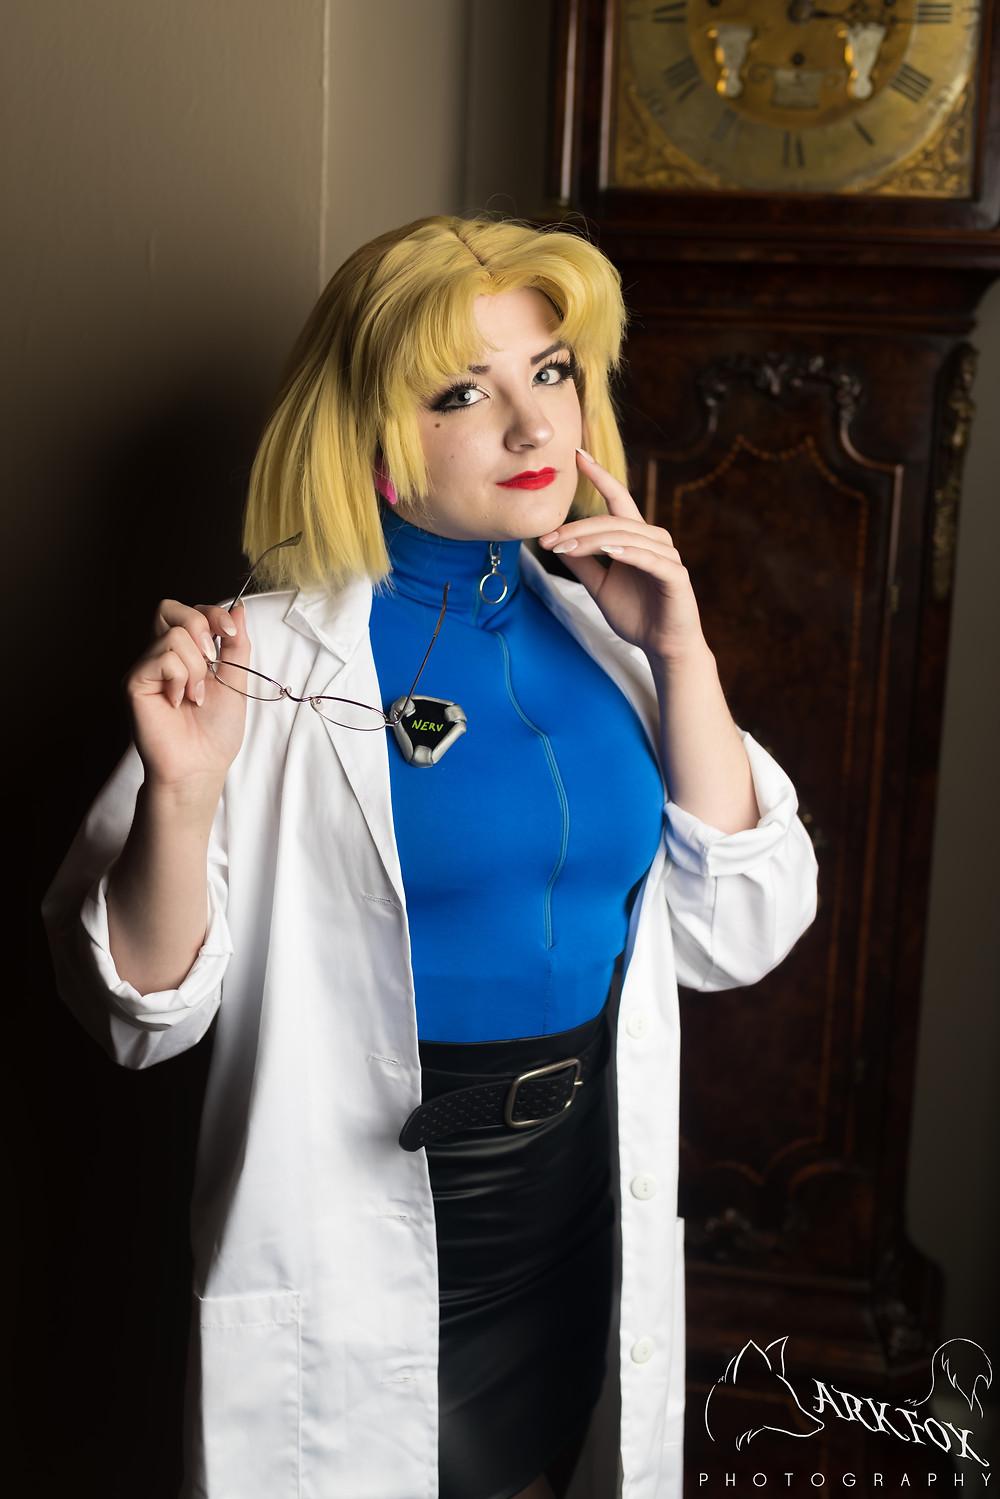 Ritsuko cosplayer from Evangelion posing in front of a benjamin clock